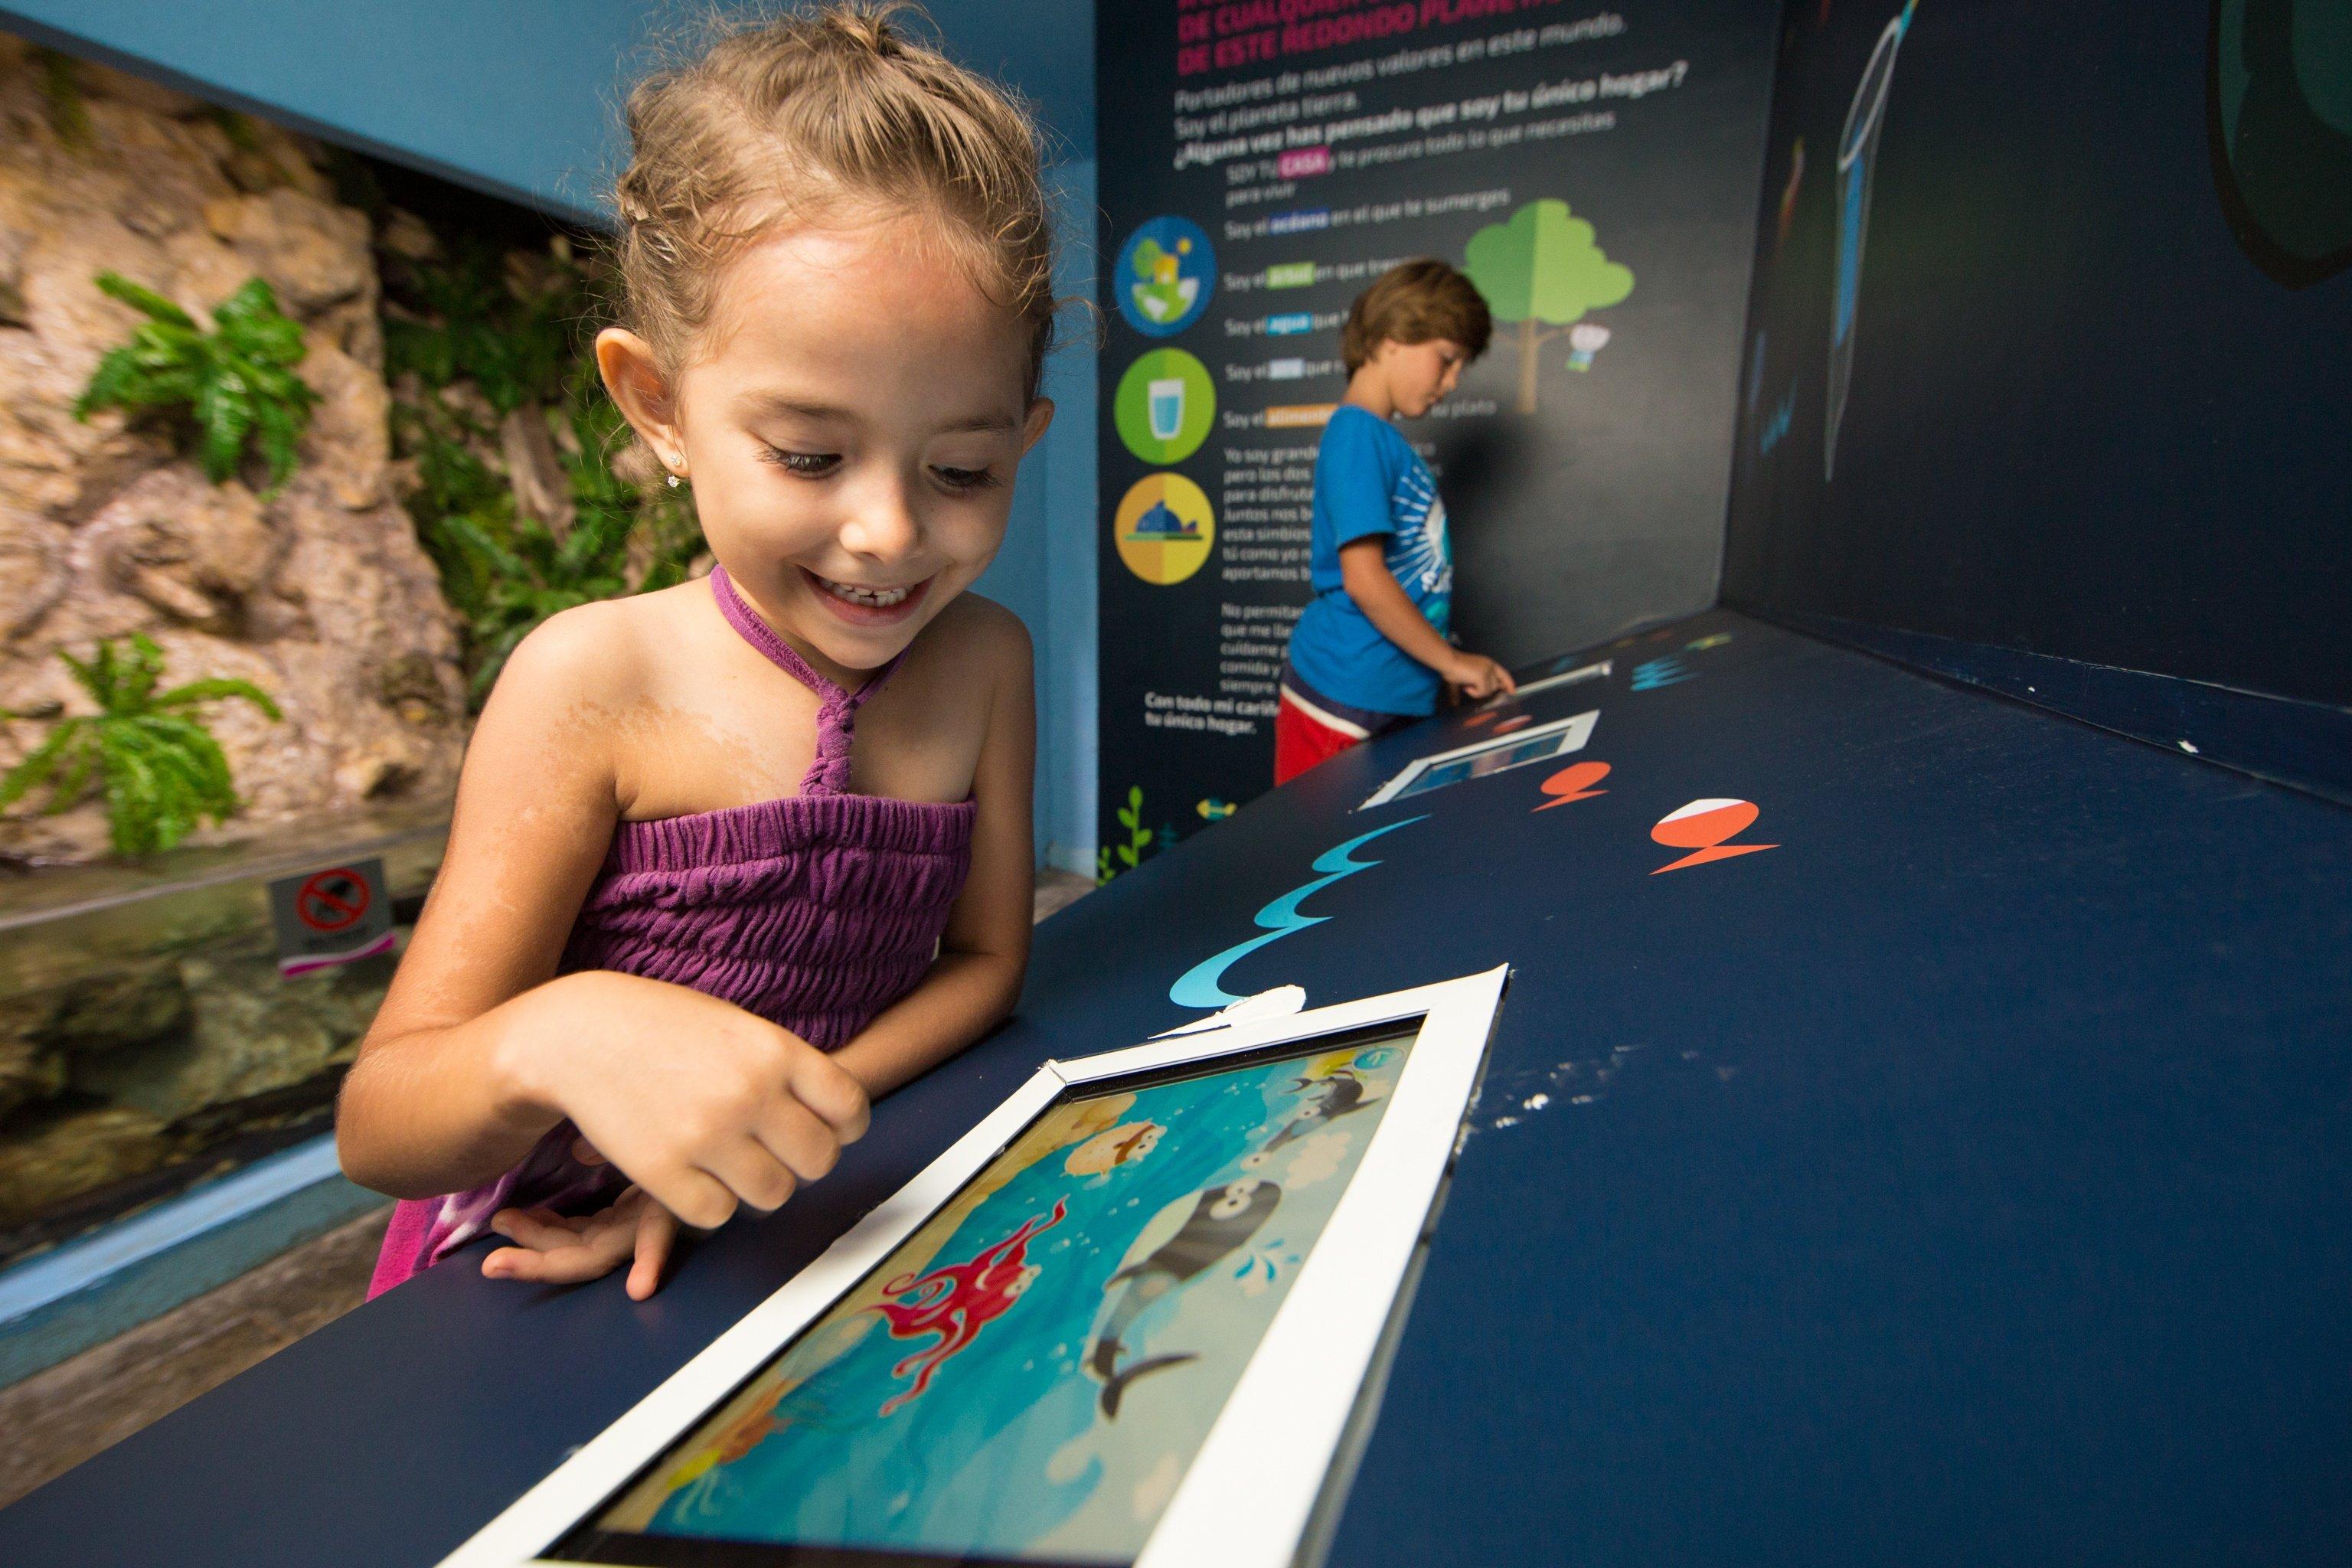 Aprendizaje didactico en la zona de ipads | Aquarium Cancún